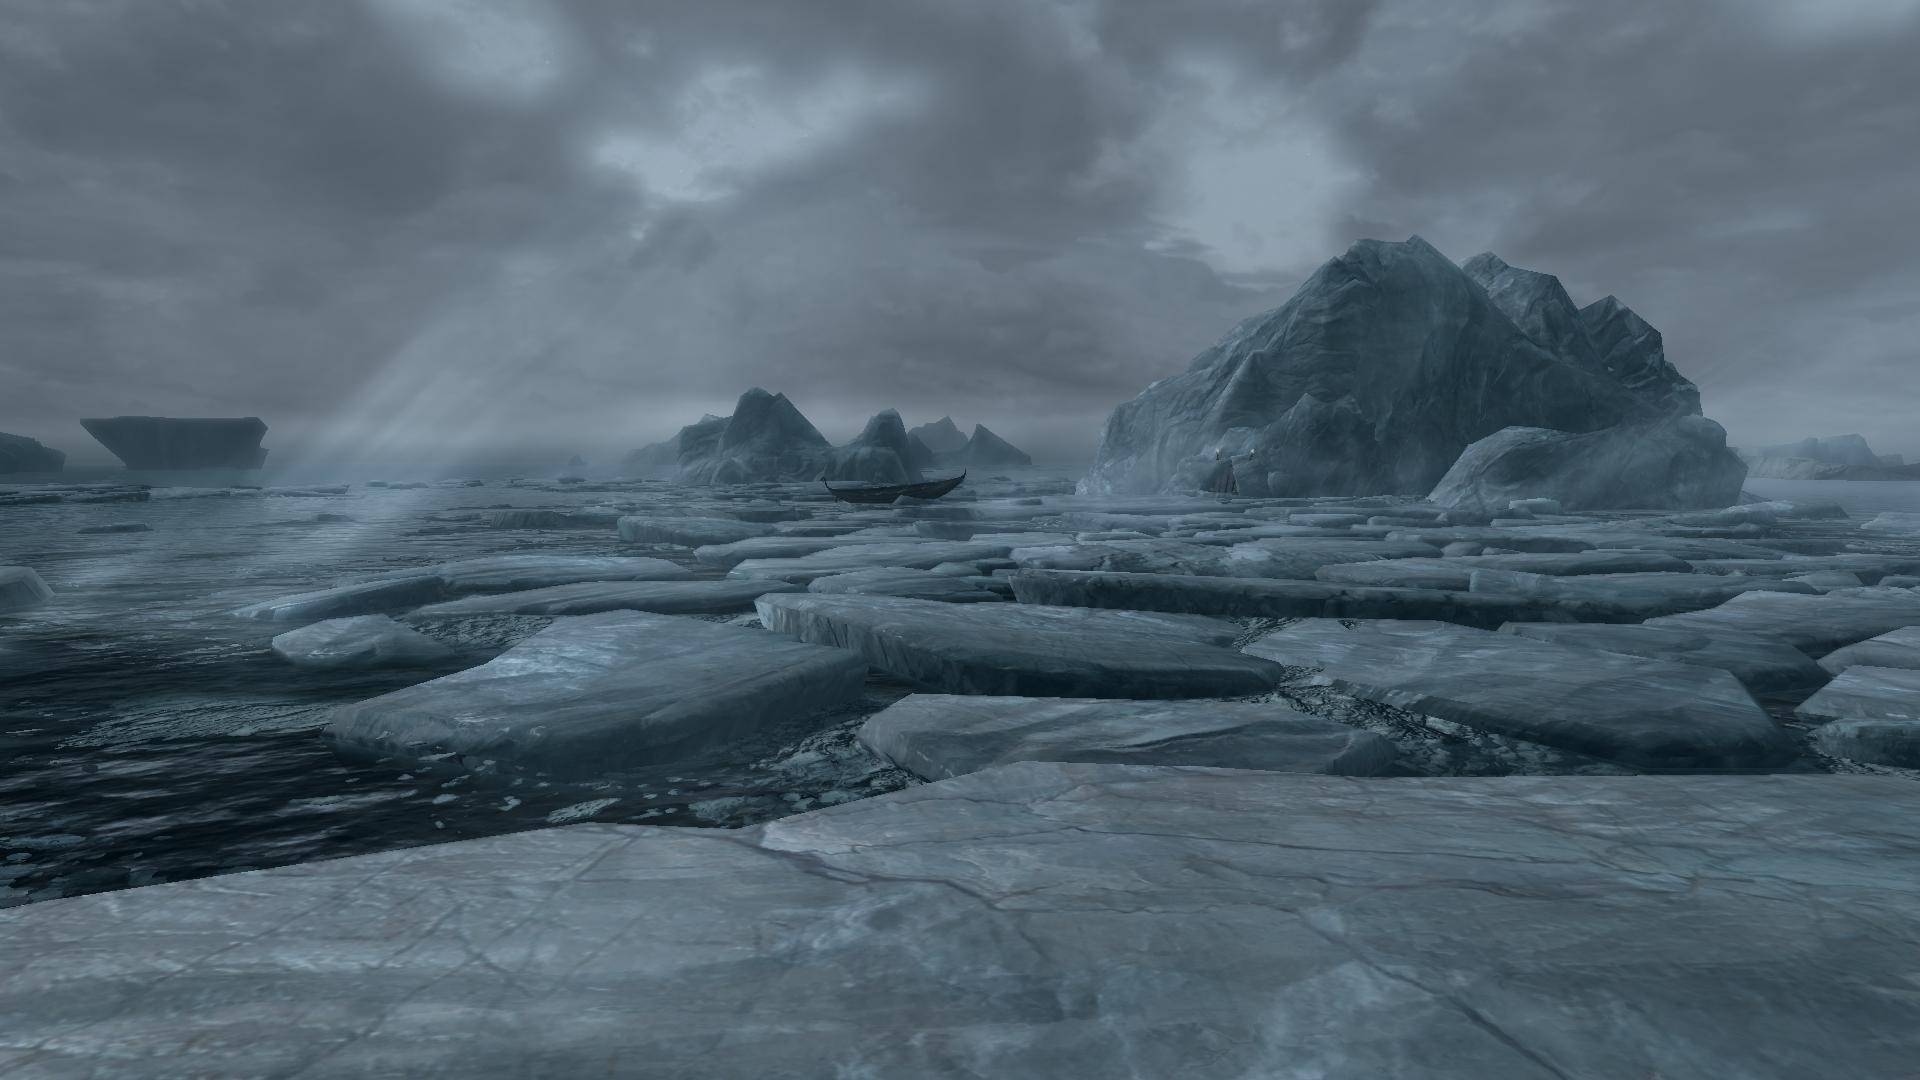 000795.Jpg - Elder Scrolls 5: Skyrim, the